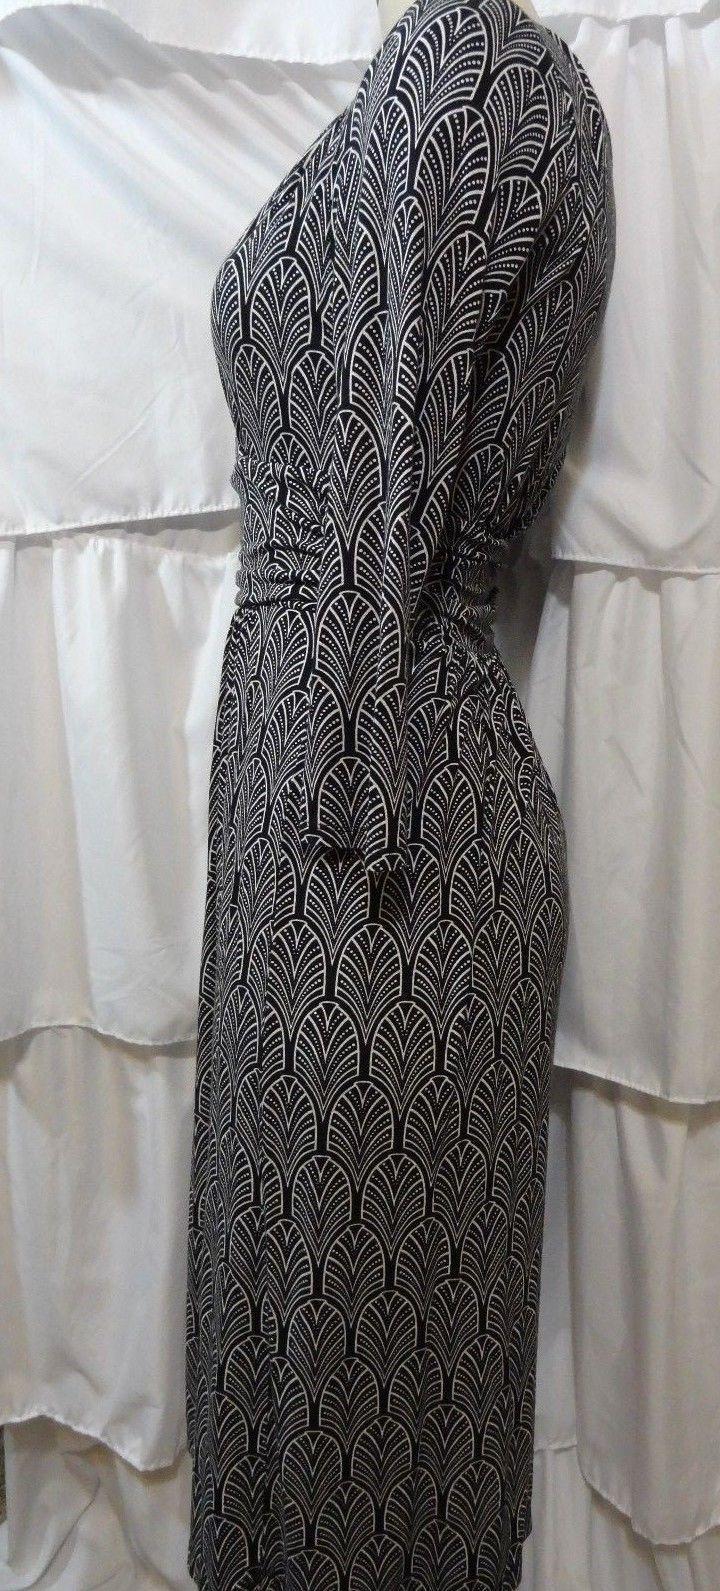 Maeve Women's Dress Mock Wrap 3/4 Sleeve SZ S Anthropologie